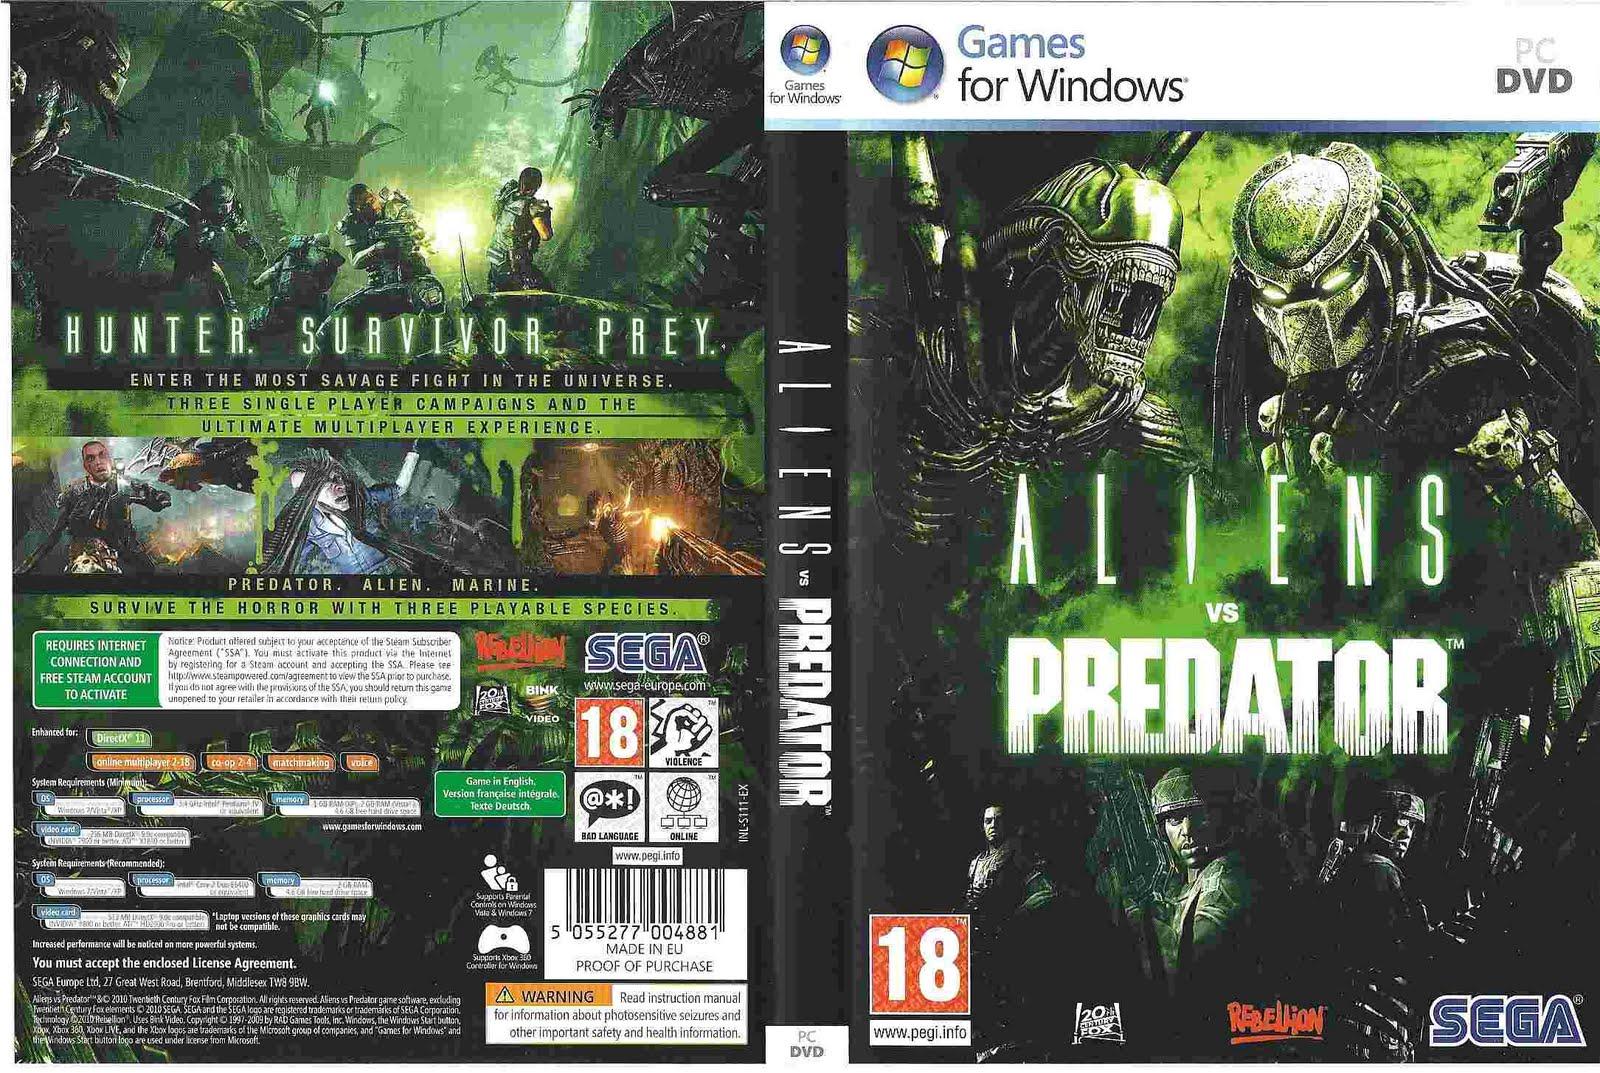 Aliens vs. Predator - Download